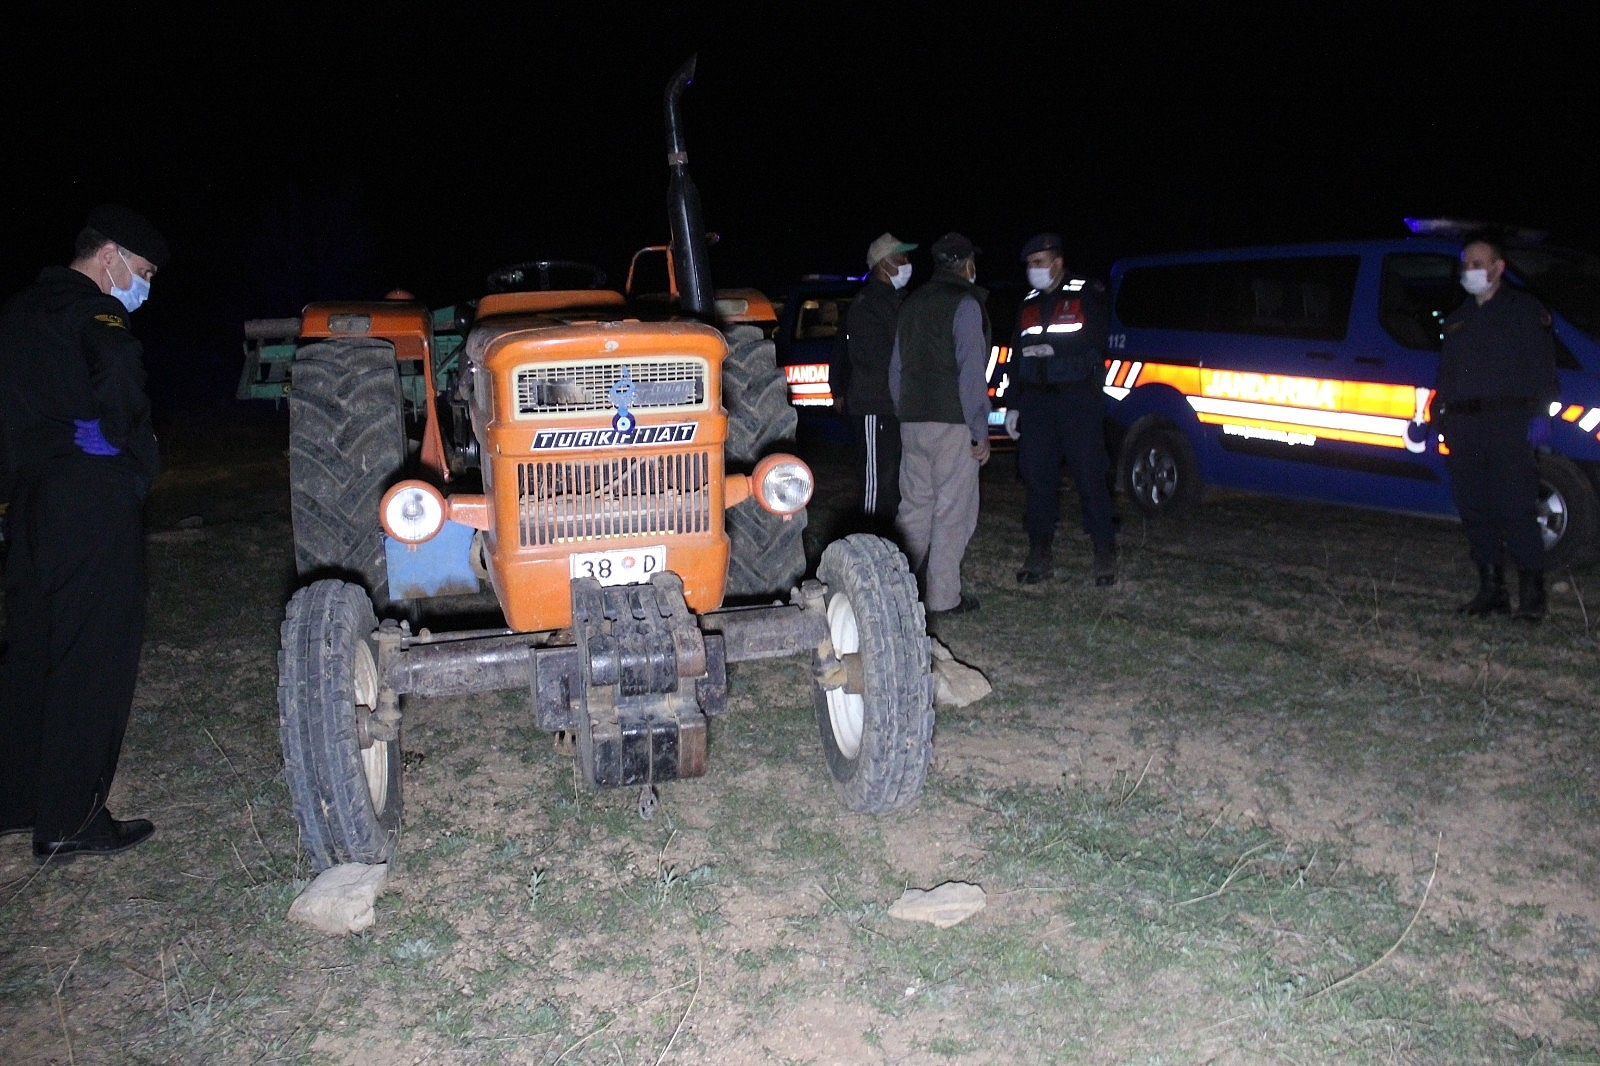 2021/04/karamanda-traktorun-altinda-kalan-ciftci-hayatini-kaybetti-20210421AW30-3.jpg